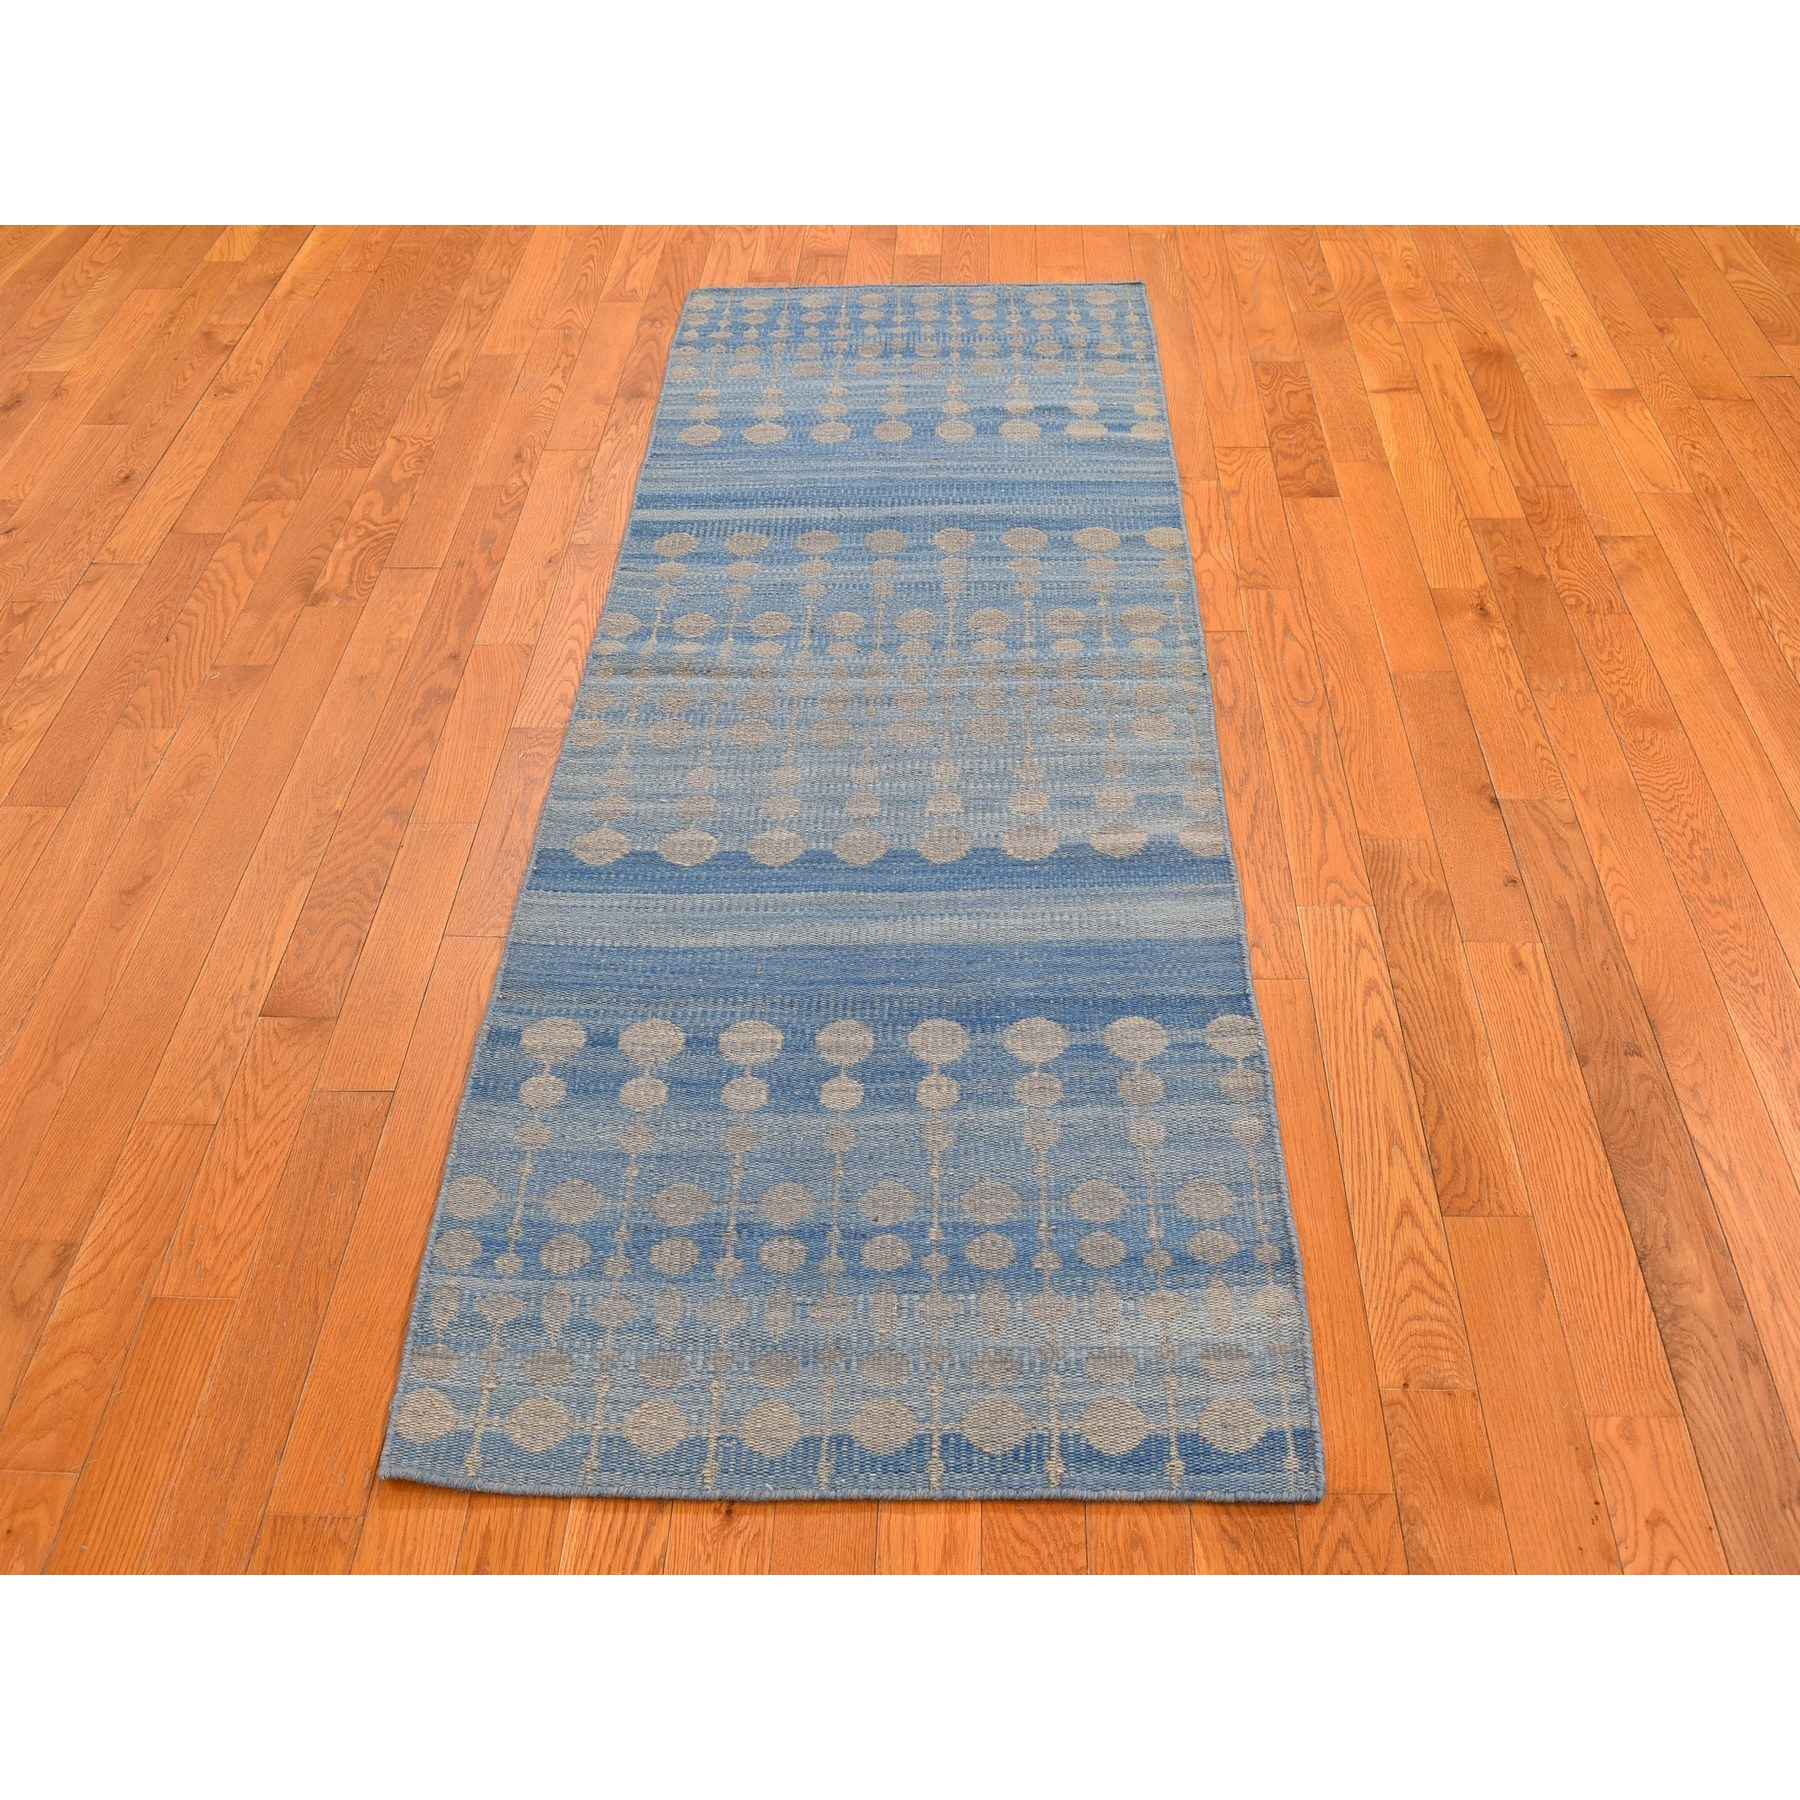 "2'7""x9'9"" Light Blue Hand Woven Dot Design Flat Weave Pure Wool Reversible Kilim Runner Oriental Rug"